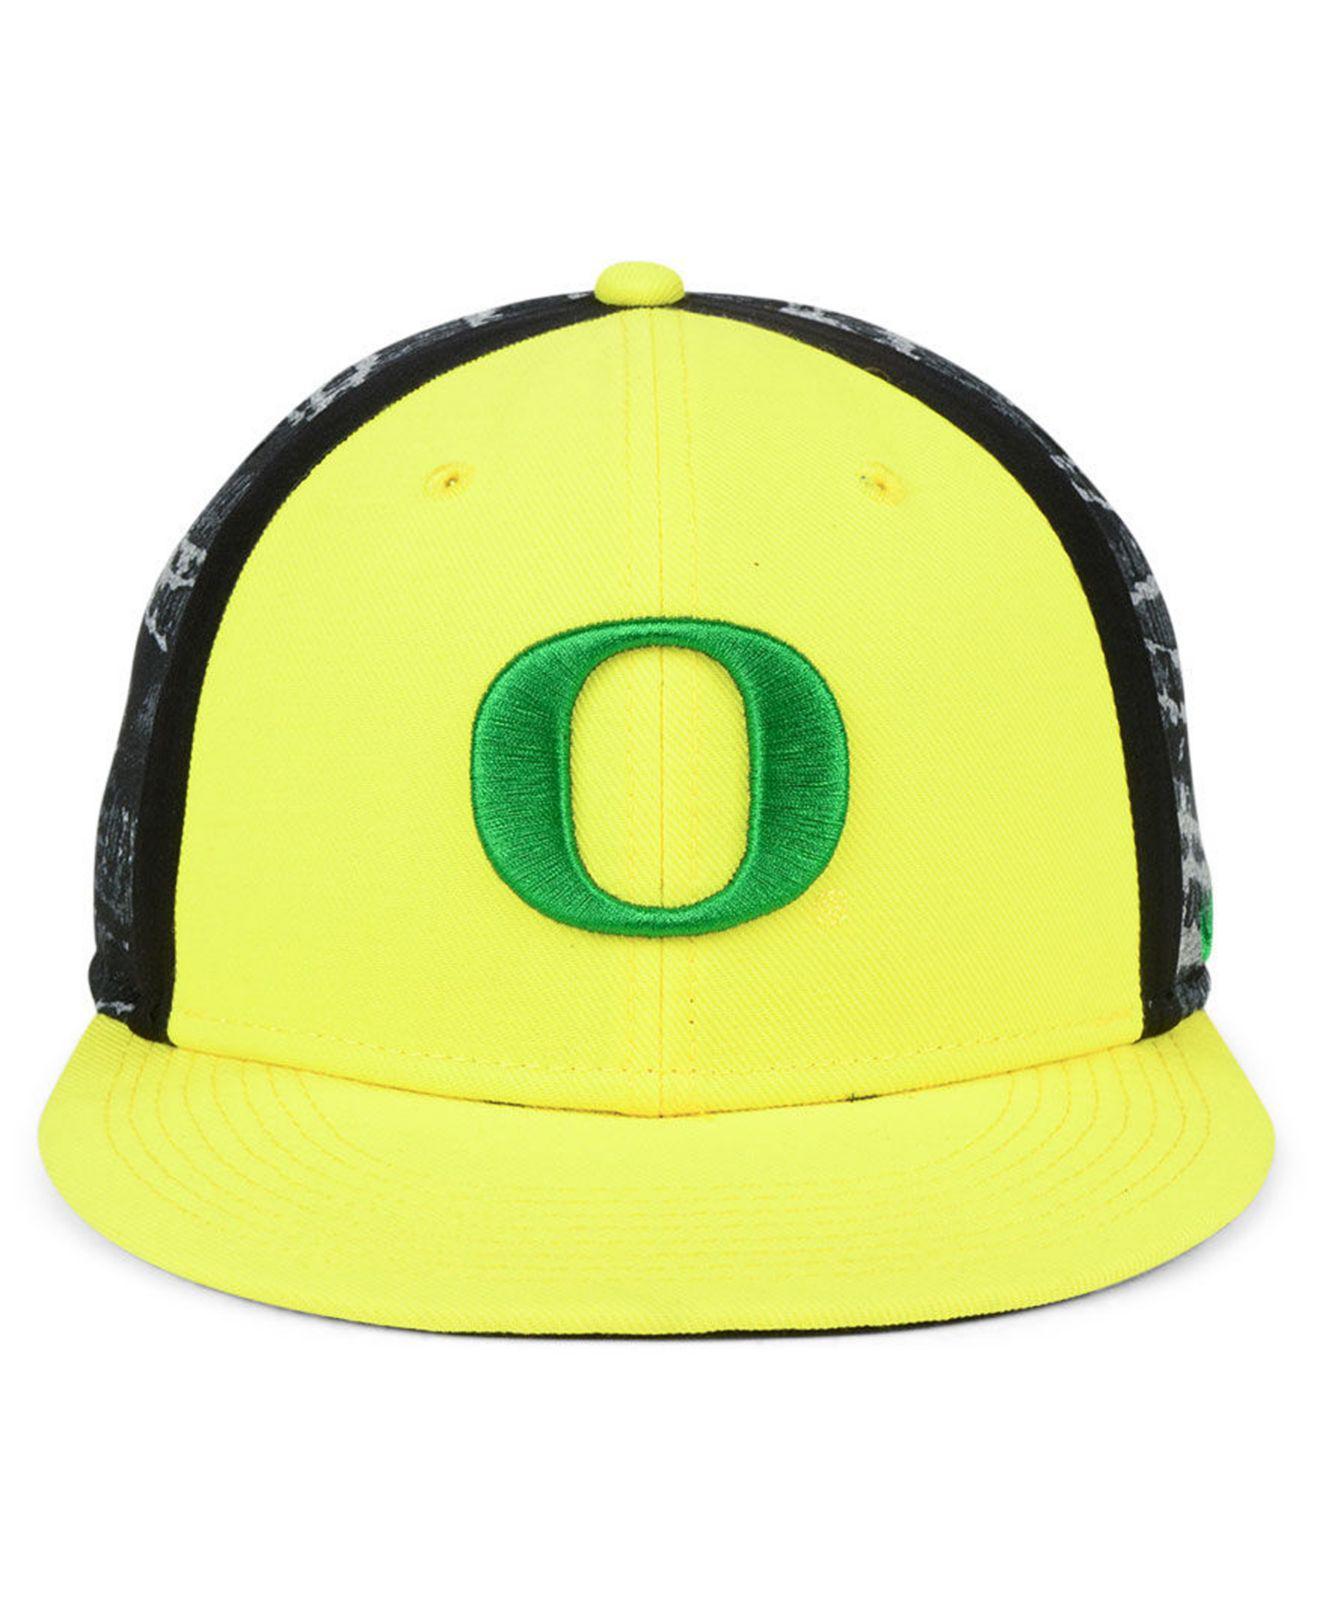 low priced 46ef5 3f206 ... netherlands nike yellow oregon ducks dna true snapback cap for men lyst.  view fullscreen d2d82